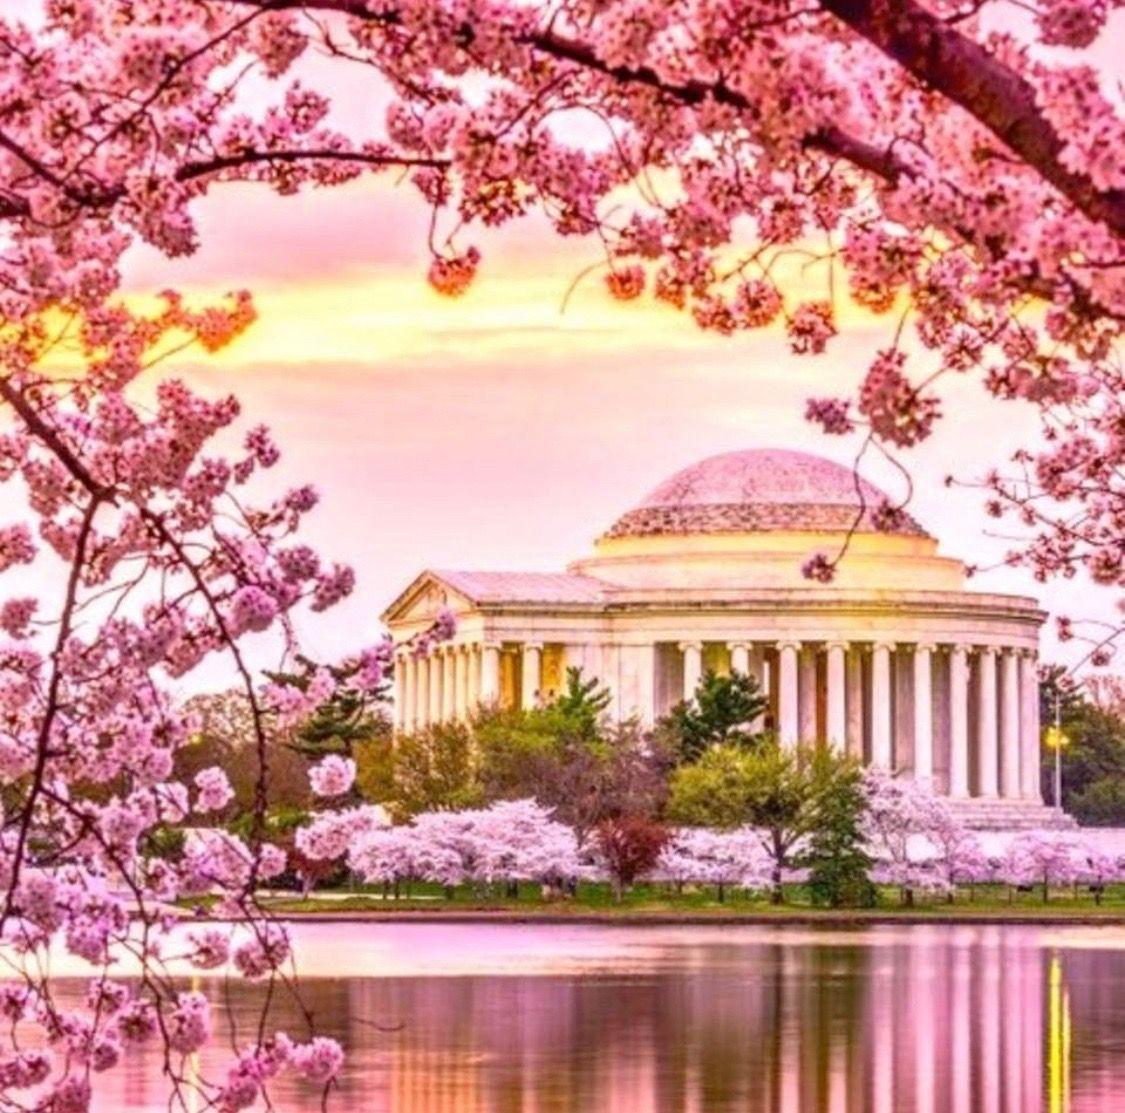 Presumably Taken By Oralia Soto Cherry Blossom Festival Dc Cherry Blossom Pictures Cherry Blossom Washington Dc